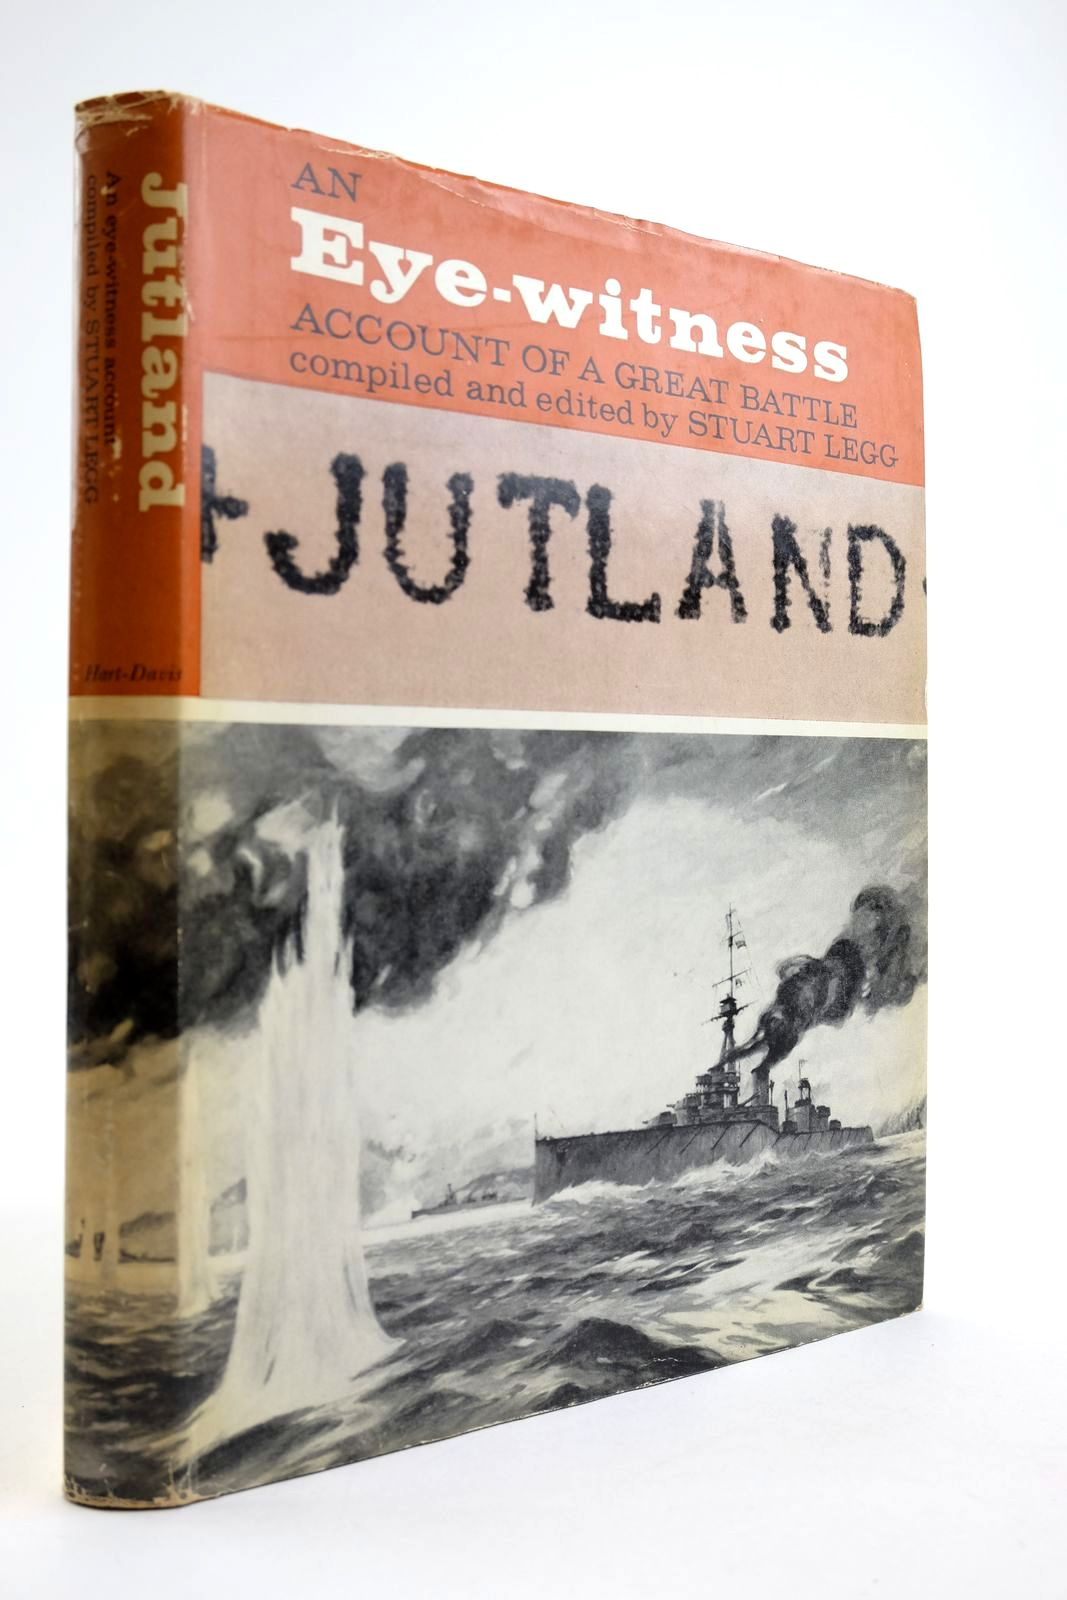 Photo of JUTLAND: AN EYE-WITNESS ACCOUNT OF A GREAT BATTLE written by Legg, Stuart published by Rupert Hart-Davis (STOCK CODE: 2134012)  for sale by Stella & Rose's Books